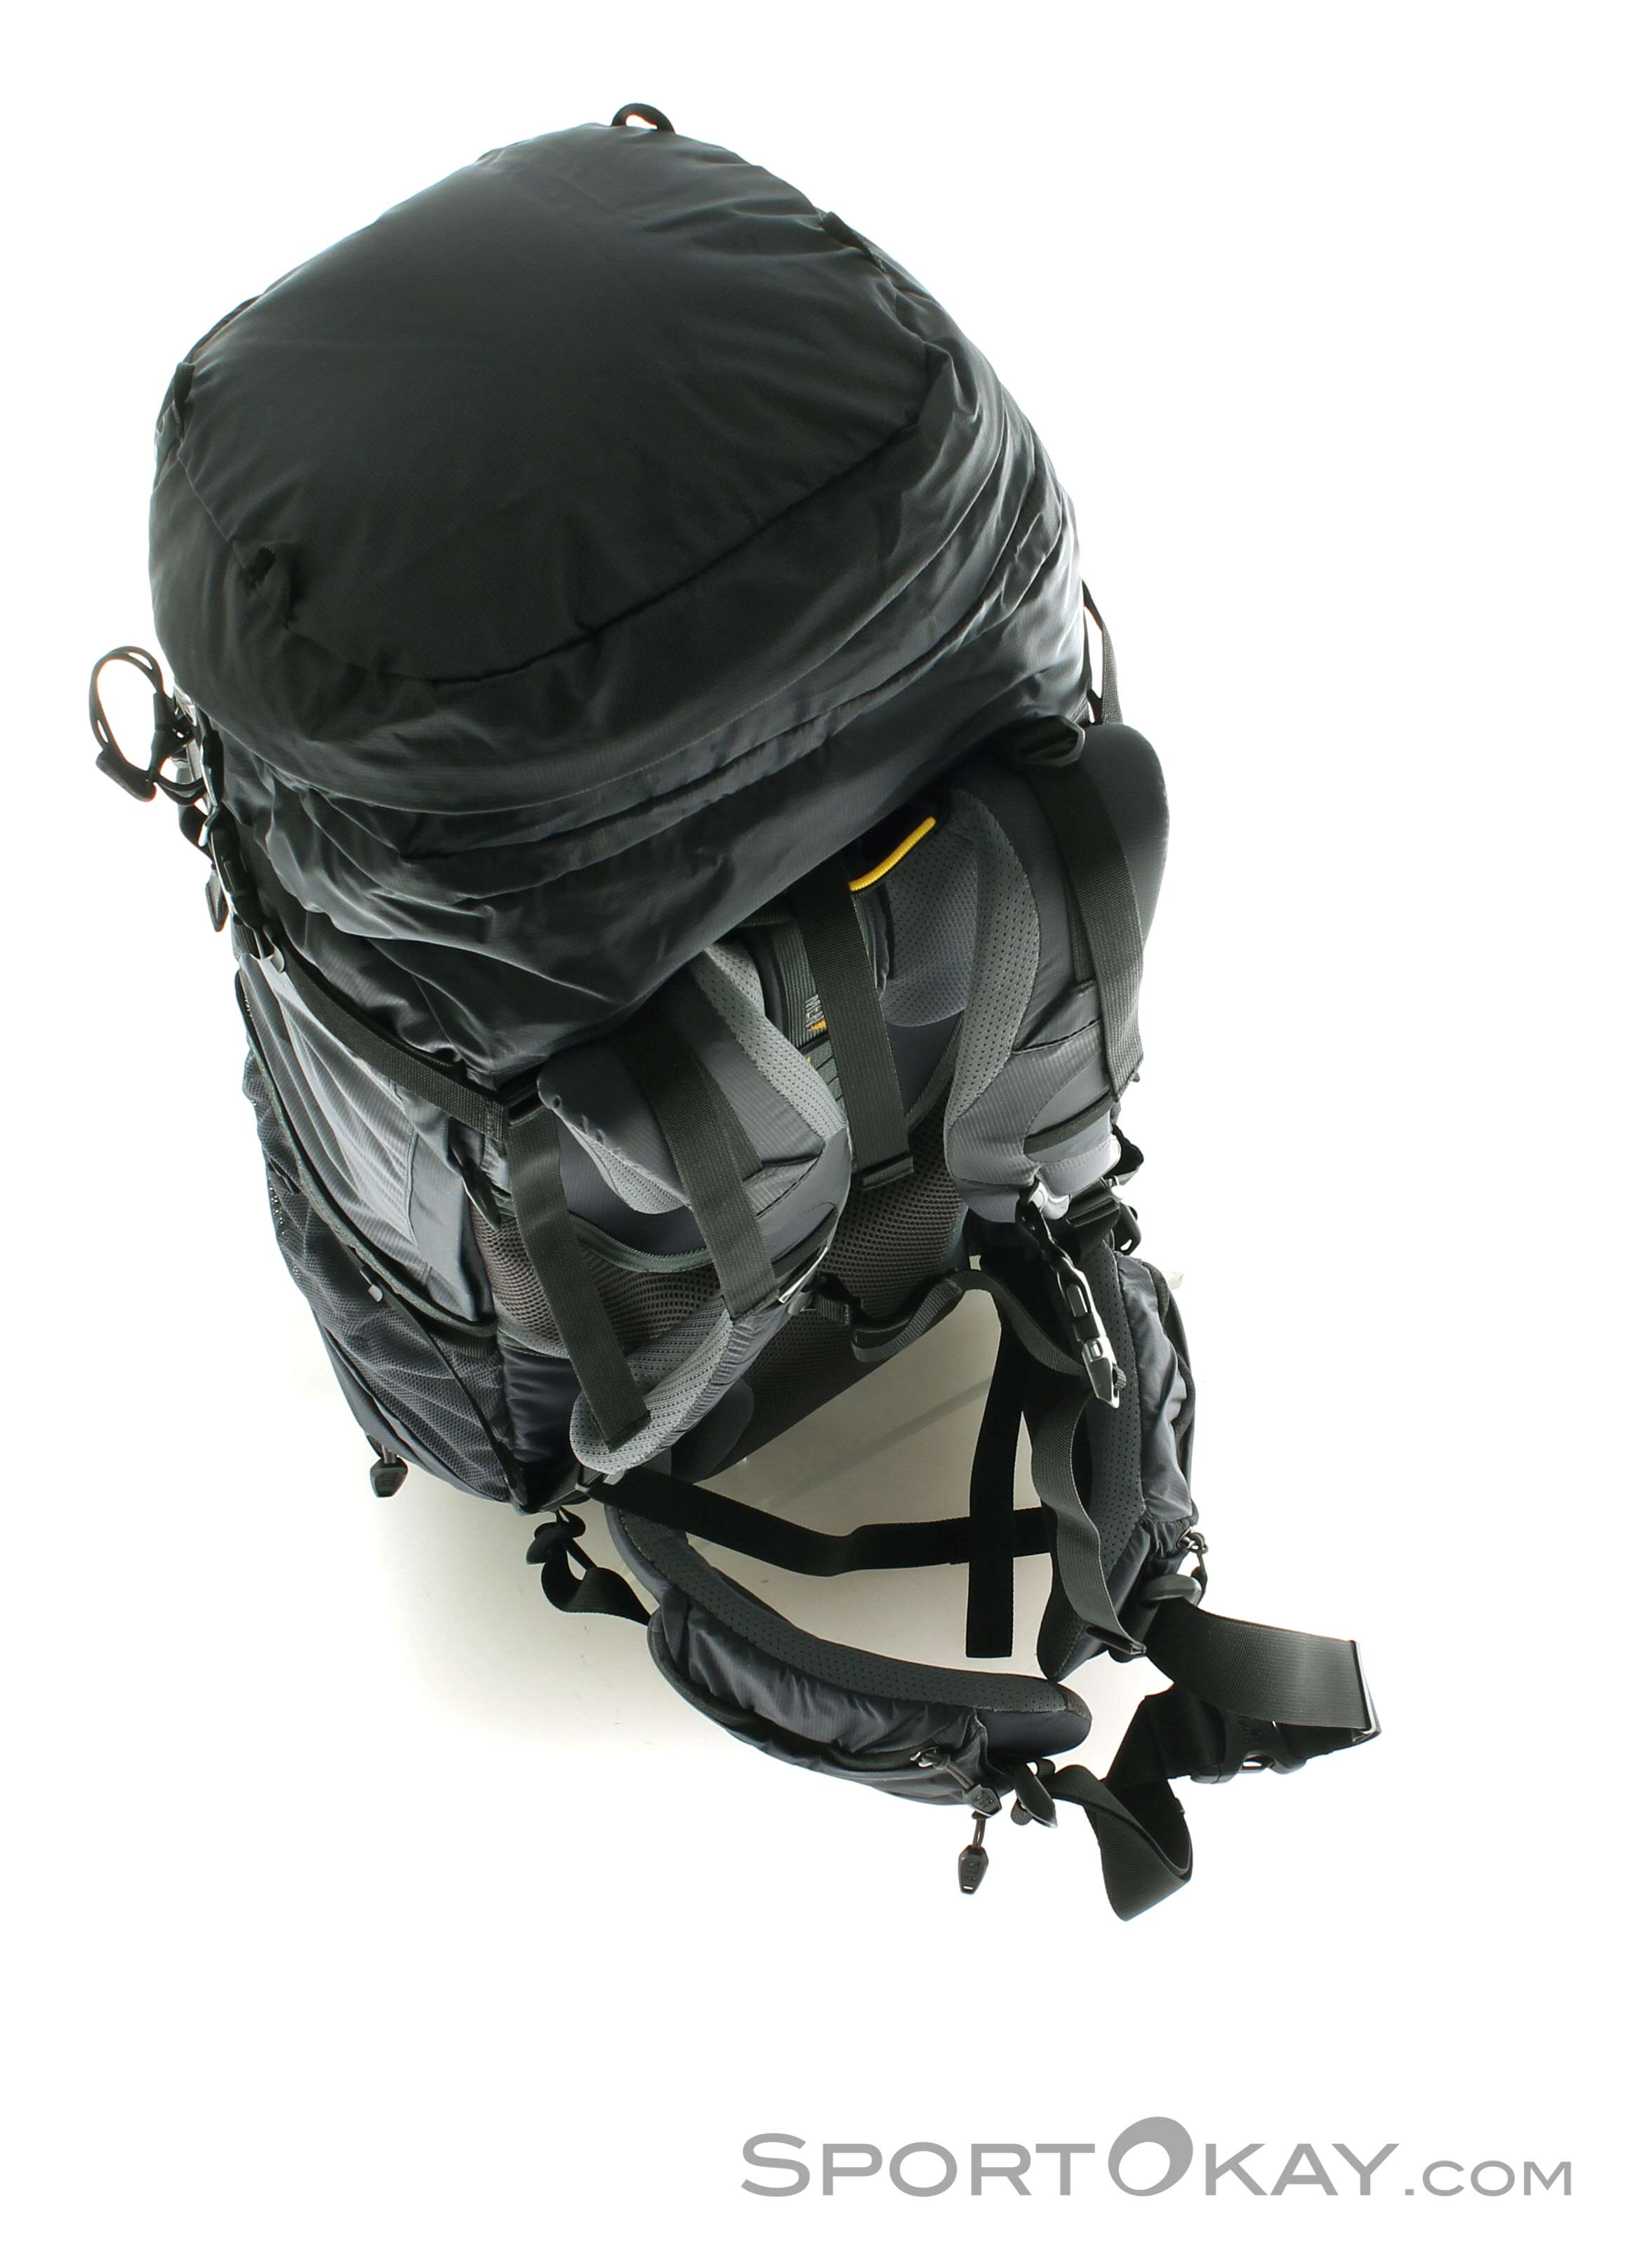 0a887b62205 Jack Wolfskin Highland Trail XT 50l Backpack, Jack Wolfskin, Black, , Male,